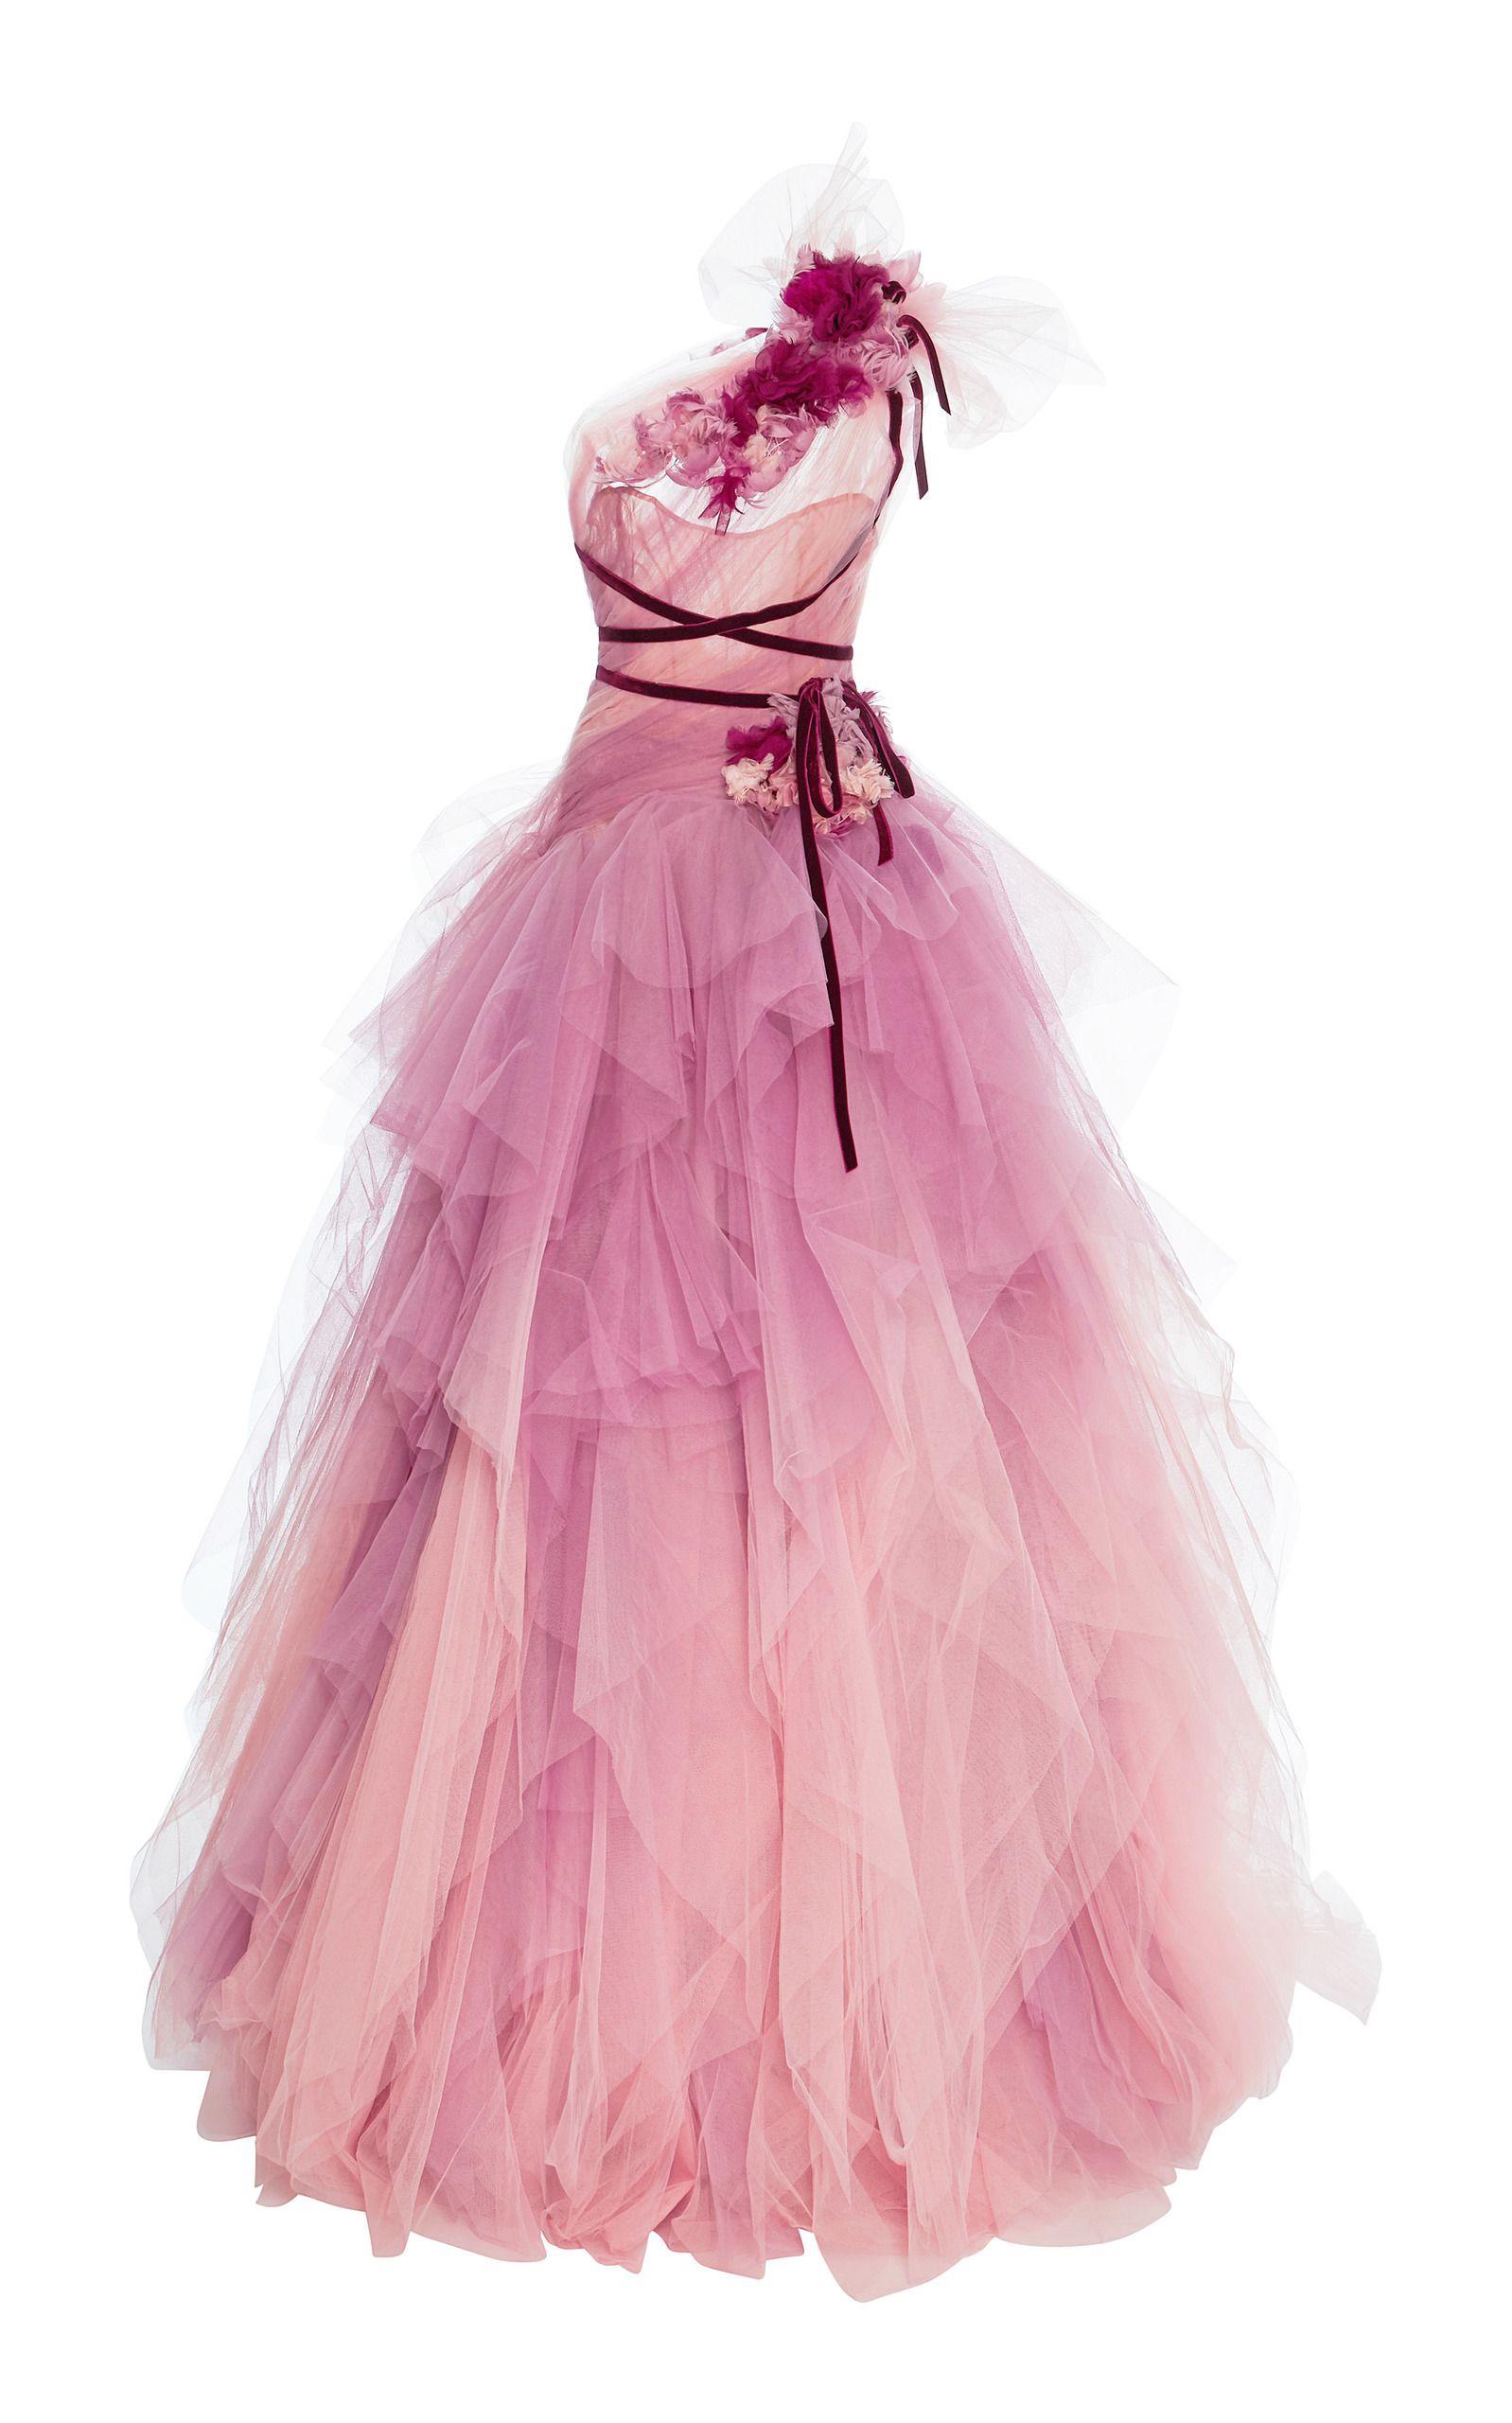 Marchesa Ombre Tulle Gown  Rosa kleid lang, Abendkleid rosa und